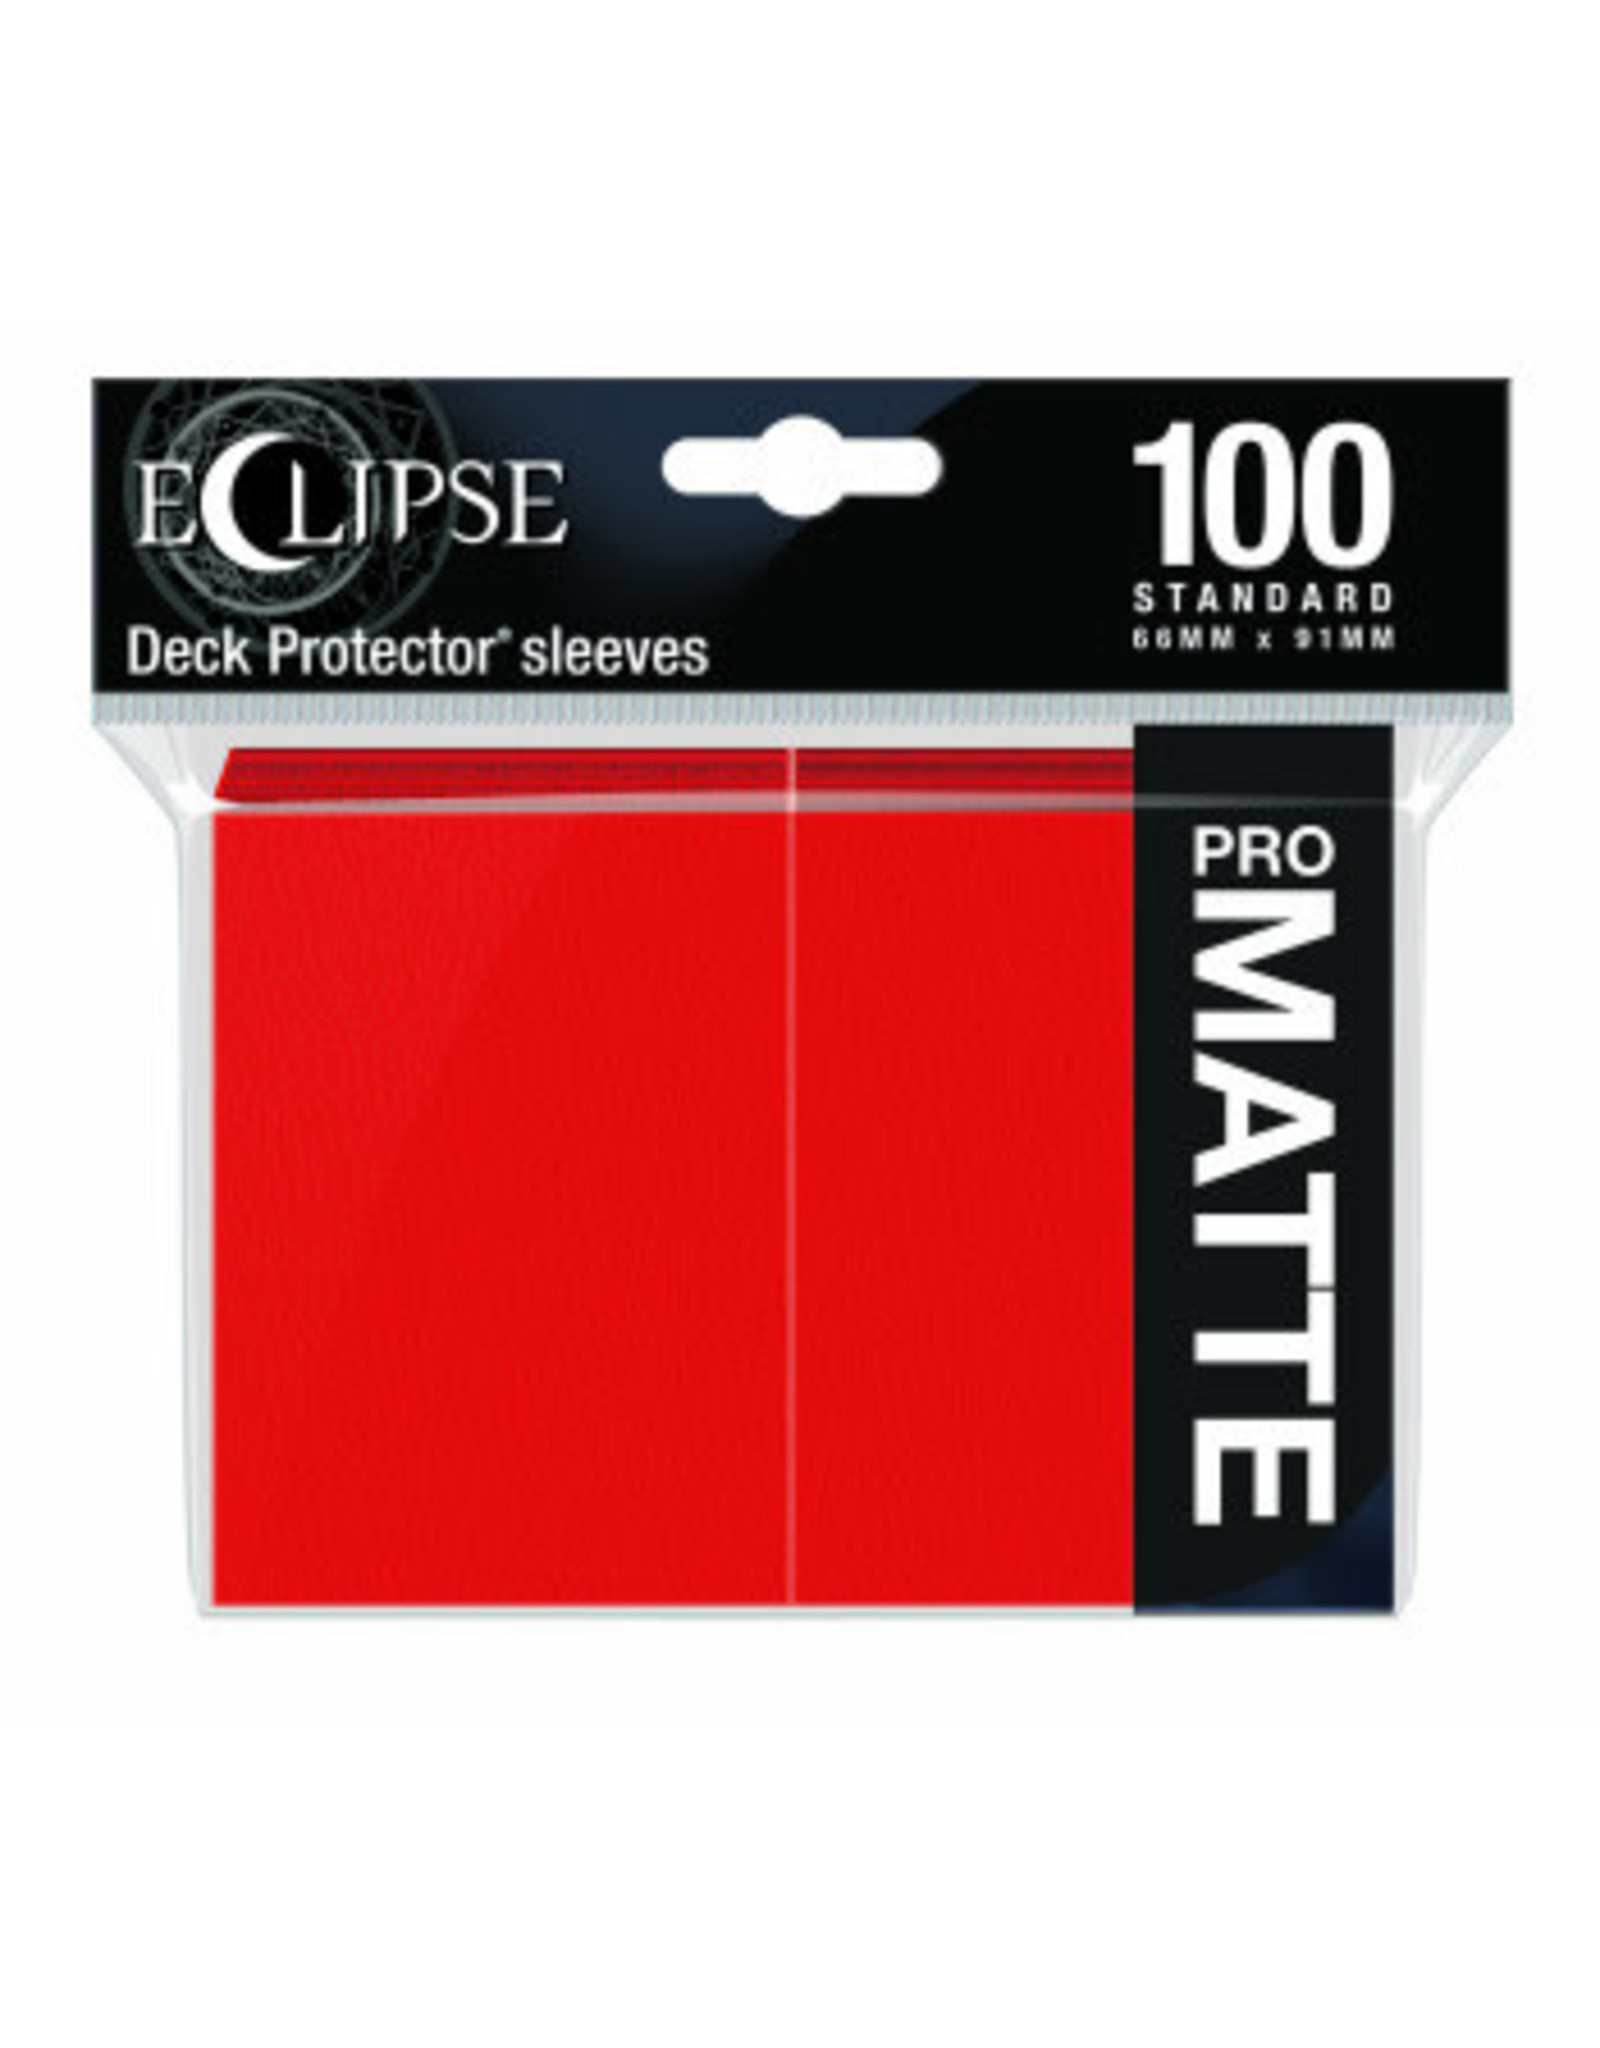 Ultra Pro Ultra Pro Eclipse Sleeves - Matte  (100)